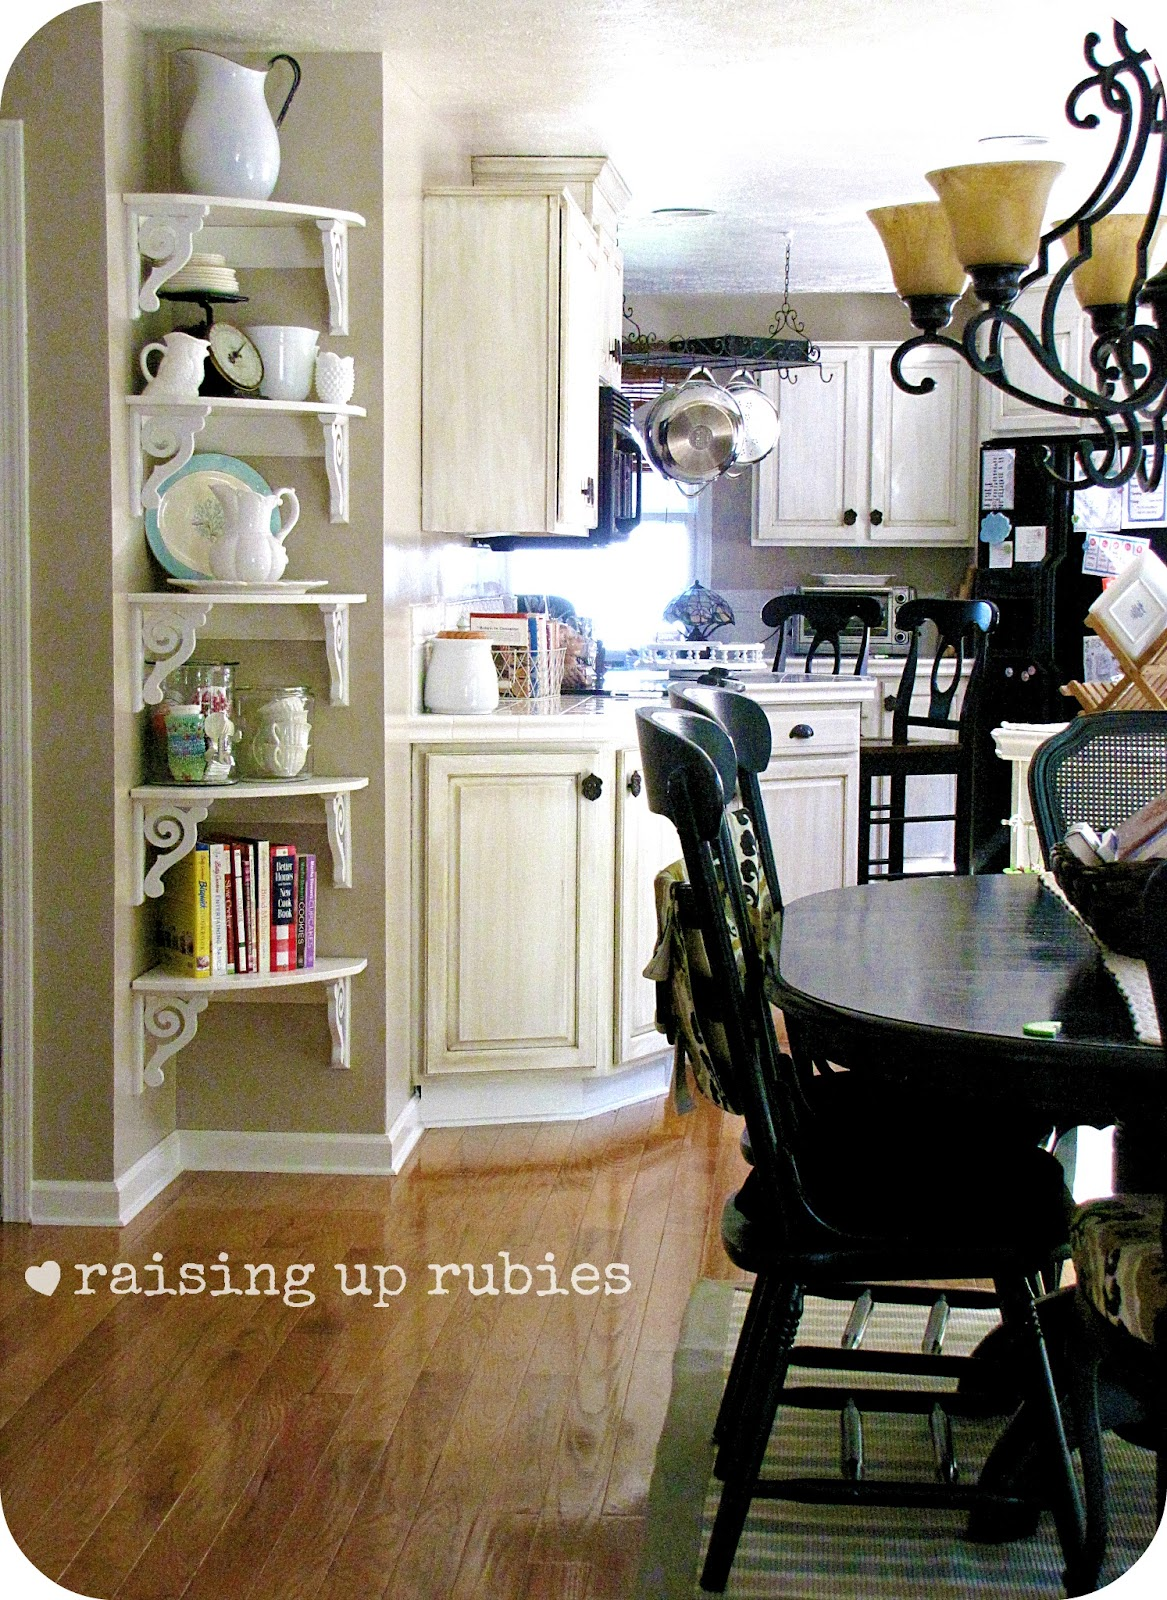 Retro kitchen shelves: vintage country kitchen decorating ideas ...